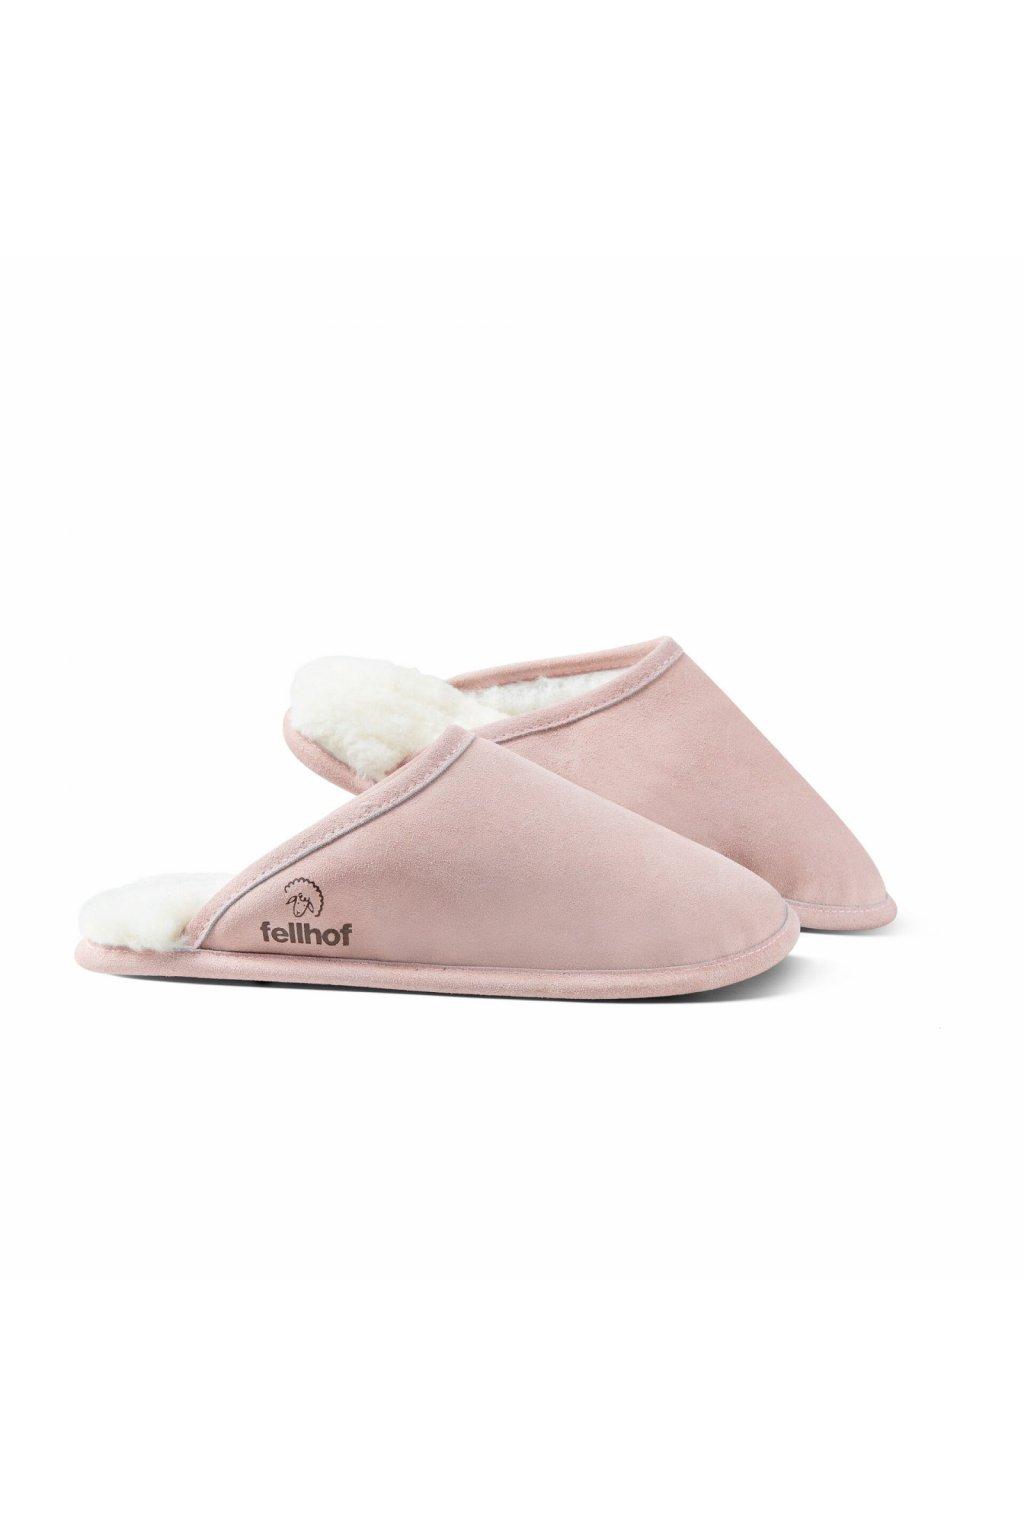 pantoffel trendy leder rosa neu g8r4dihgdt0pq6n